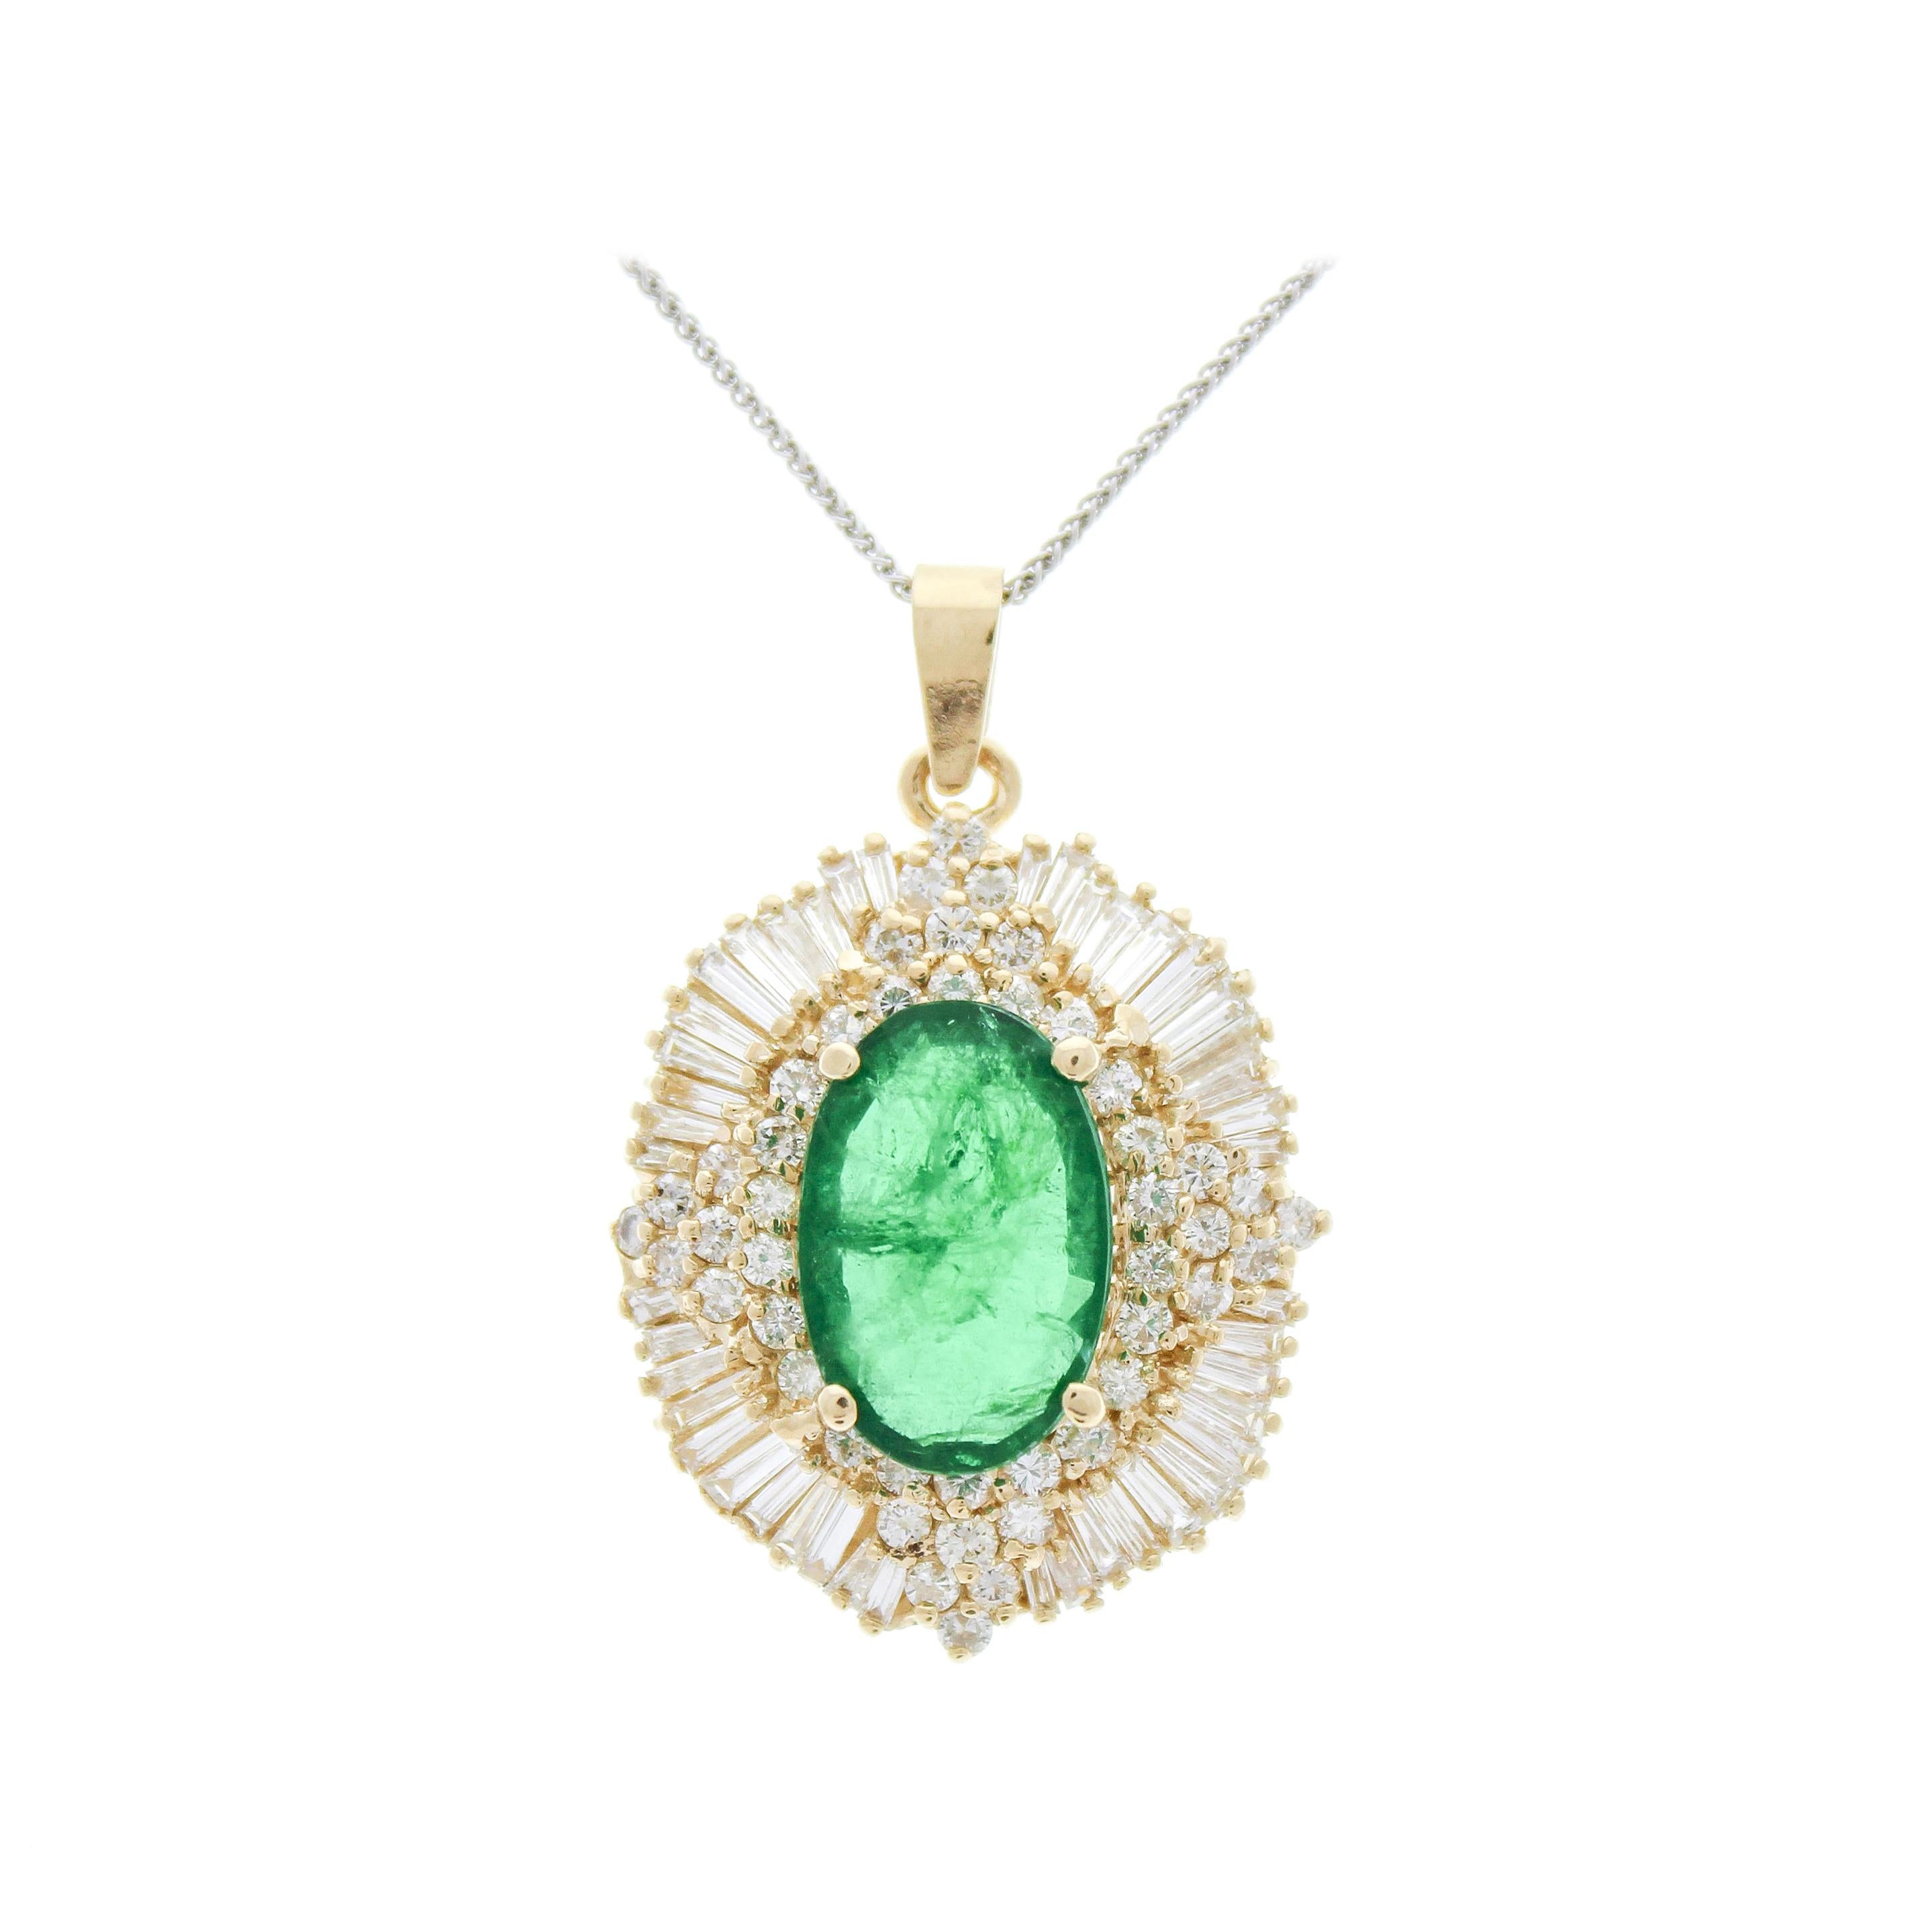 7.84 Carat GIA Certified Oval Emerald & Diamond Pendants in 18k Yellow Gold